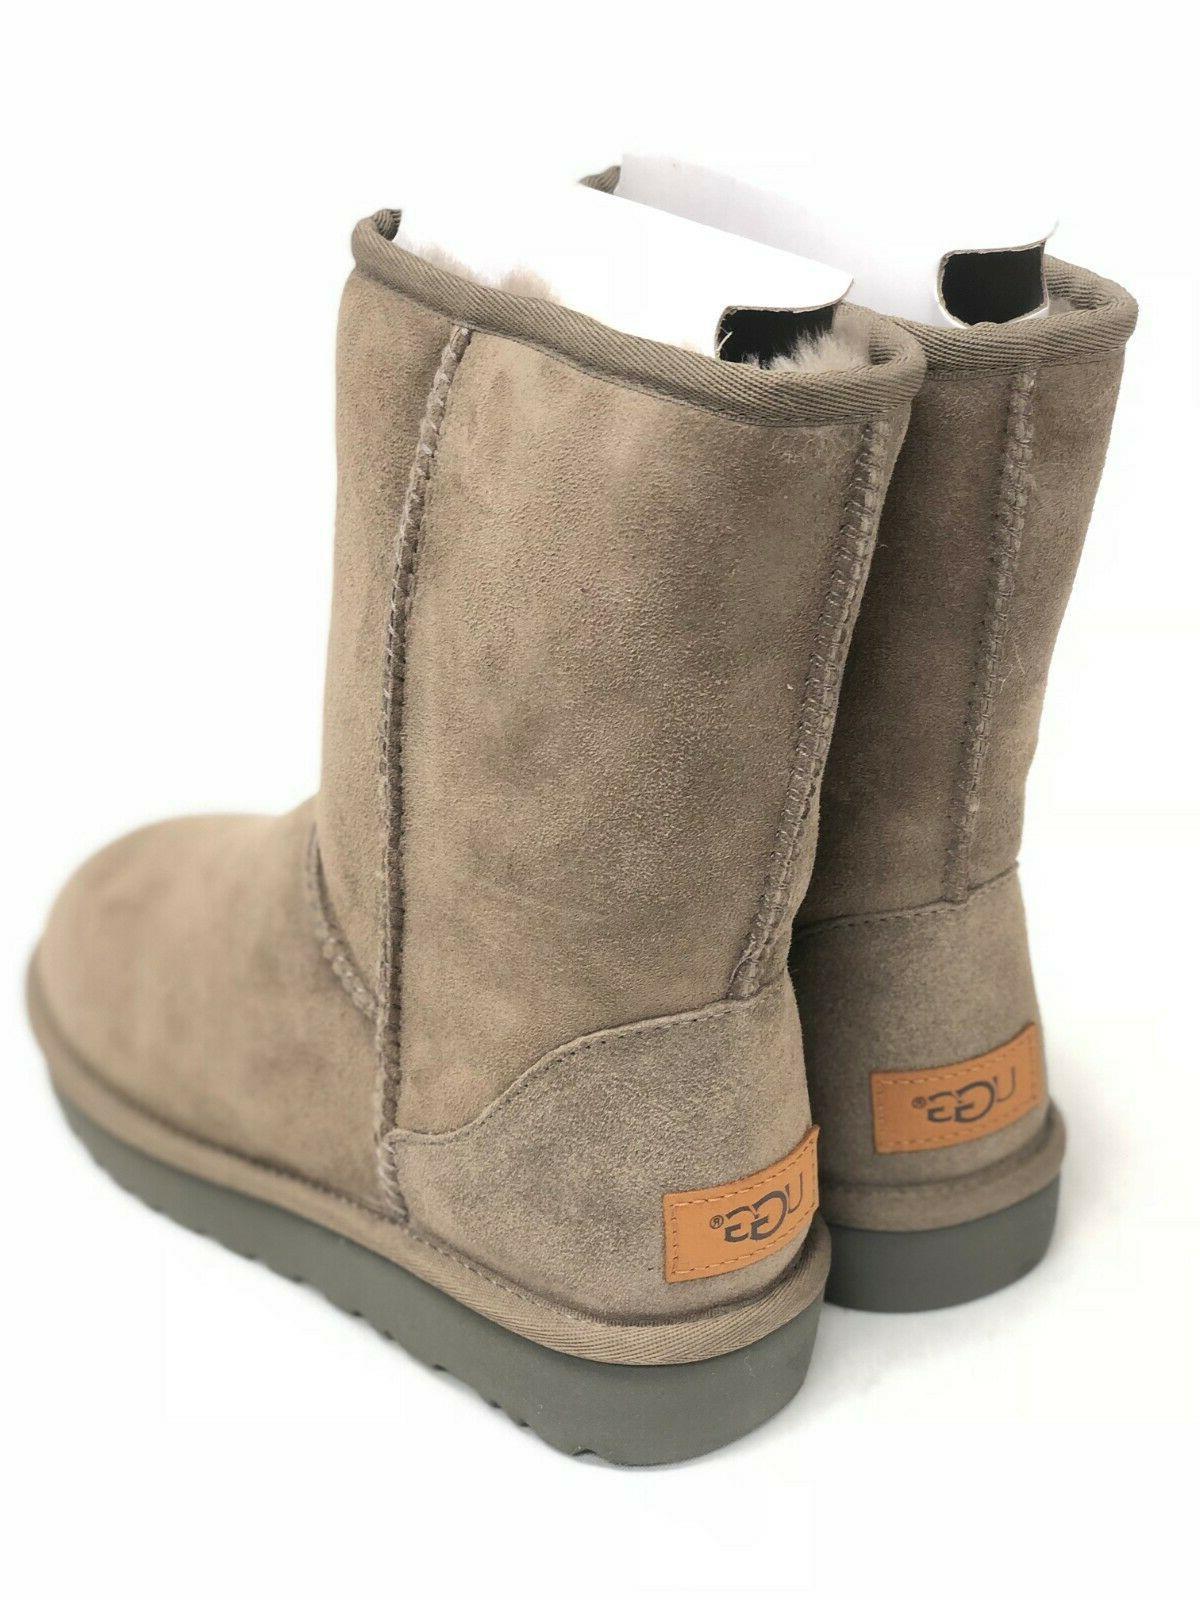 UGG Australia Short II Brindle Boots 1016223 Suede